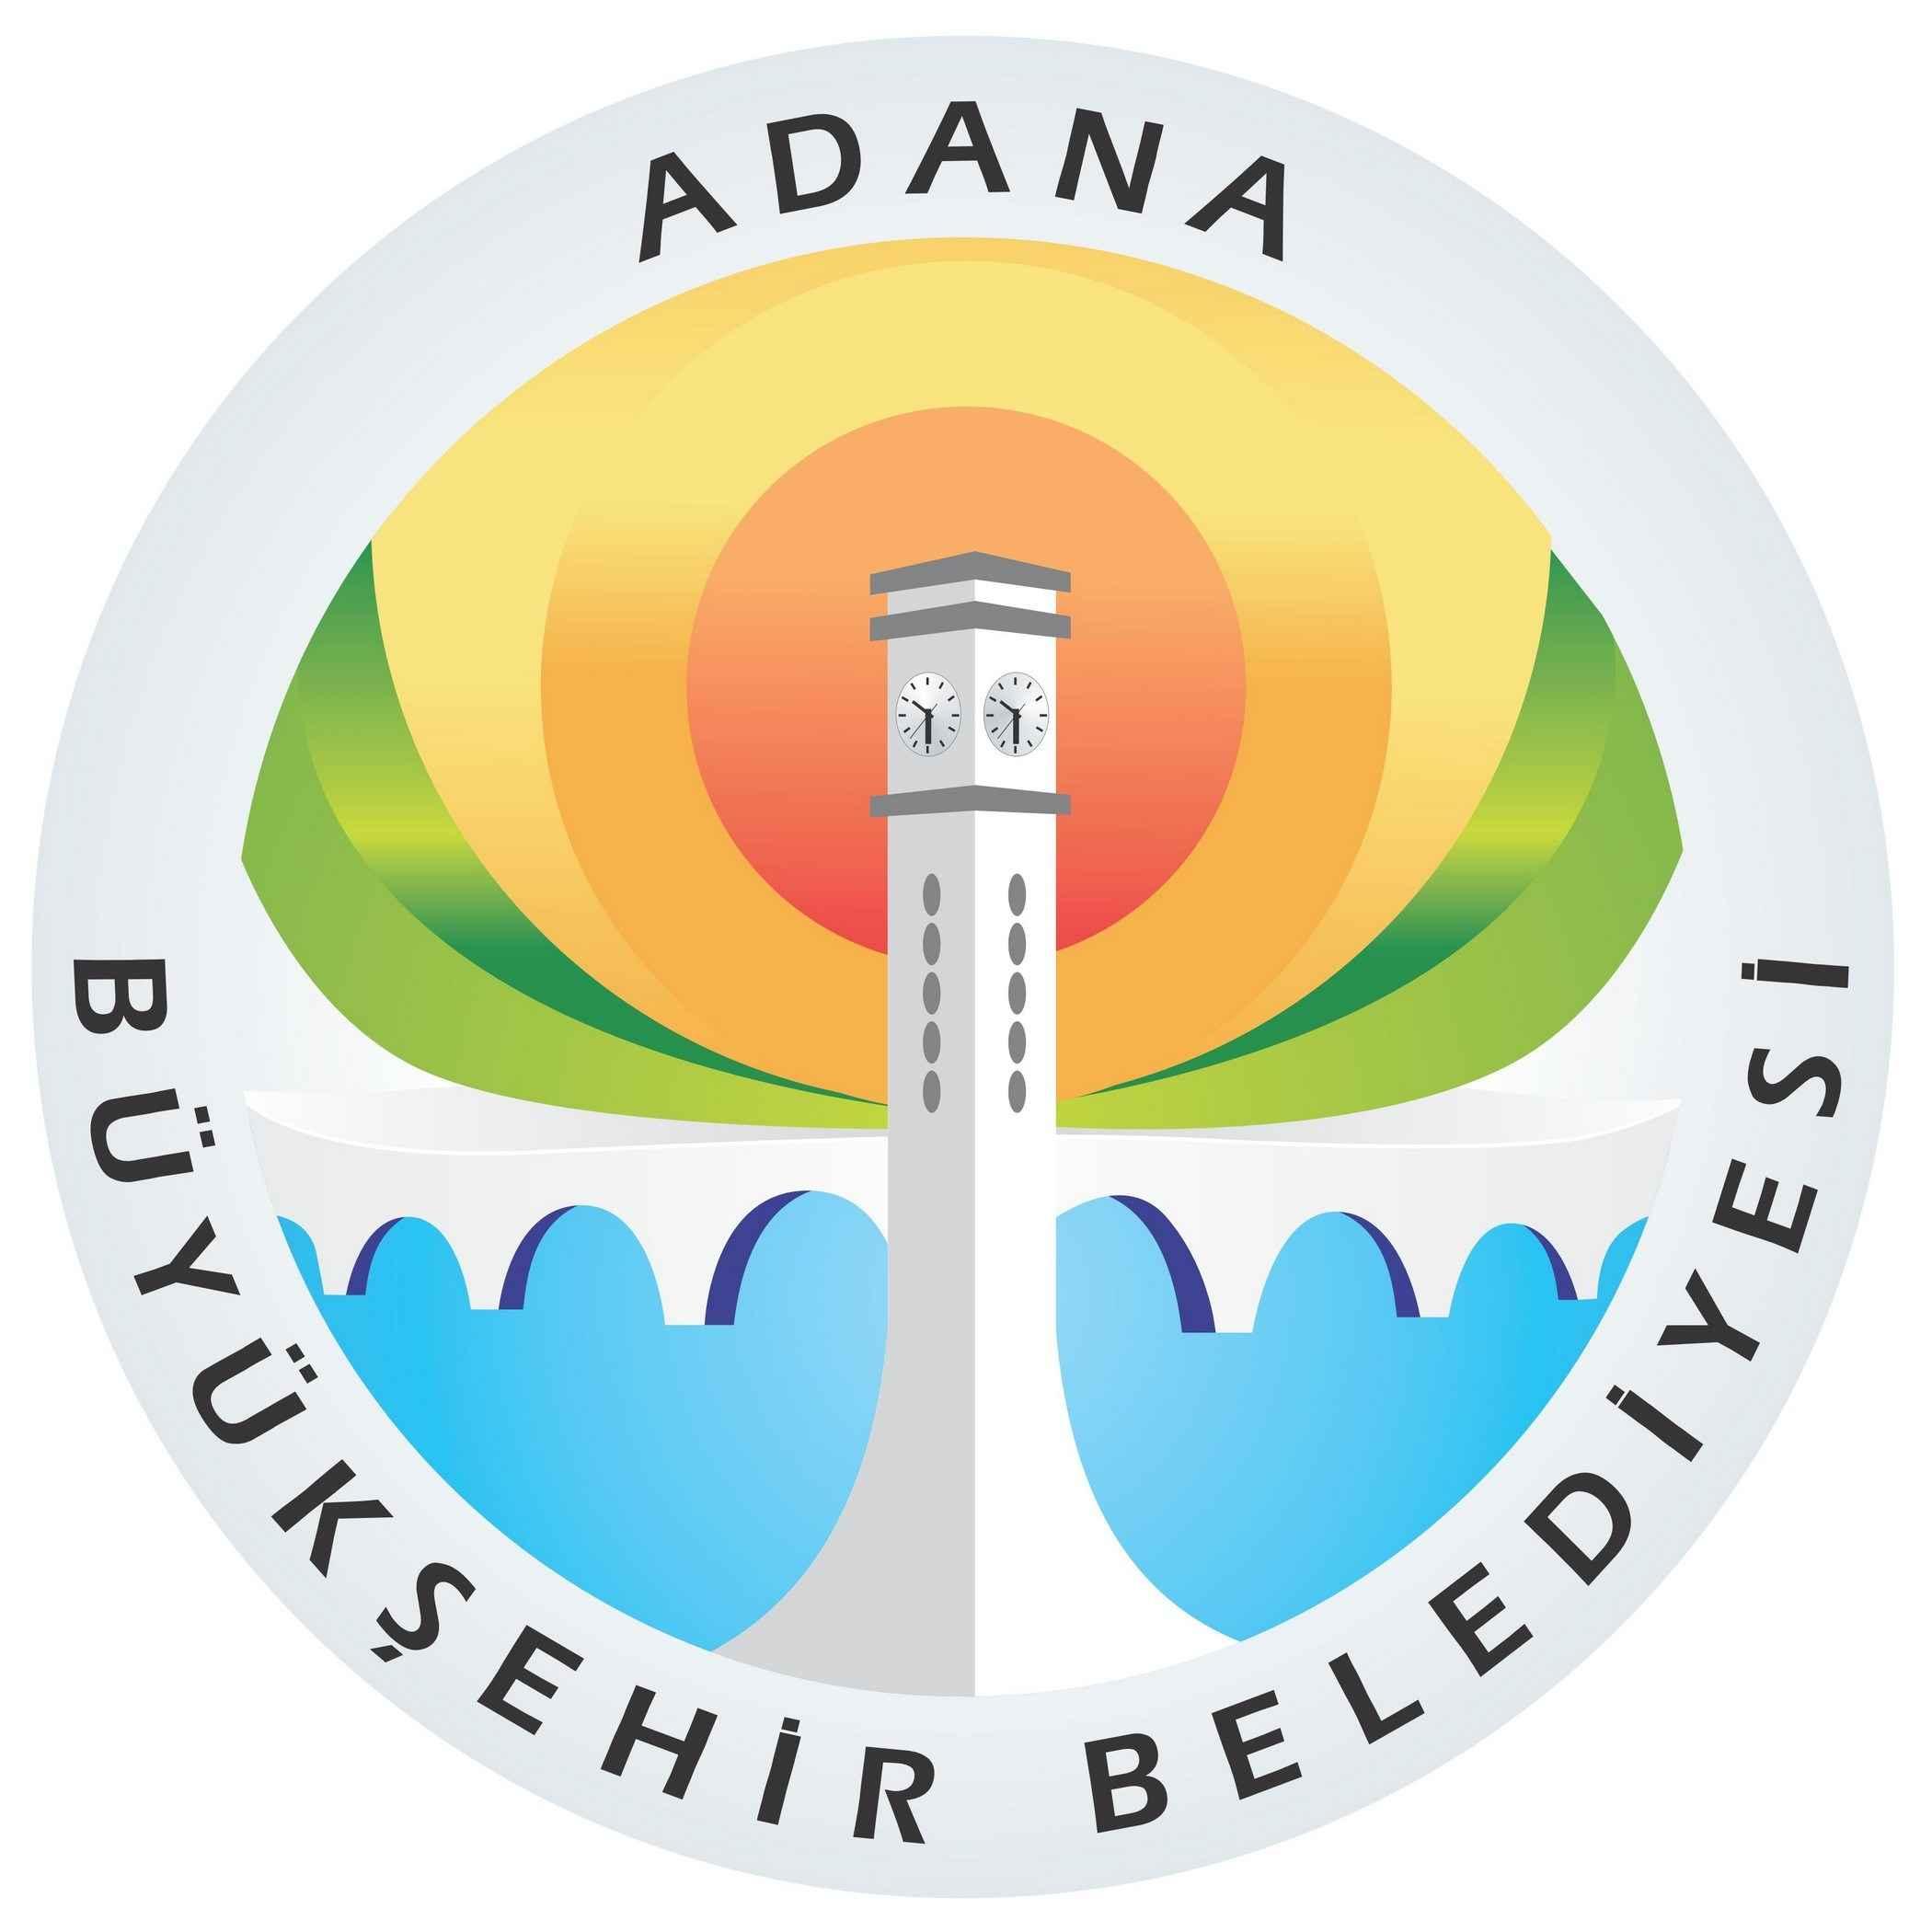 http://www.freelogovectors.net/wp-content/uploads/2013/04/adana-buyuksehir-belediyesi-logo.jpg